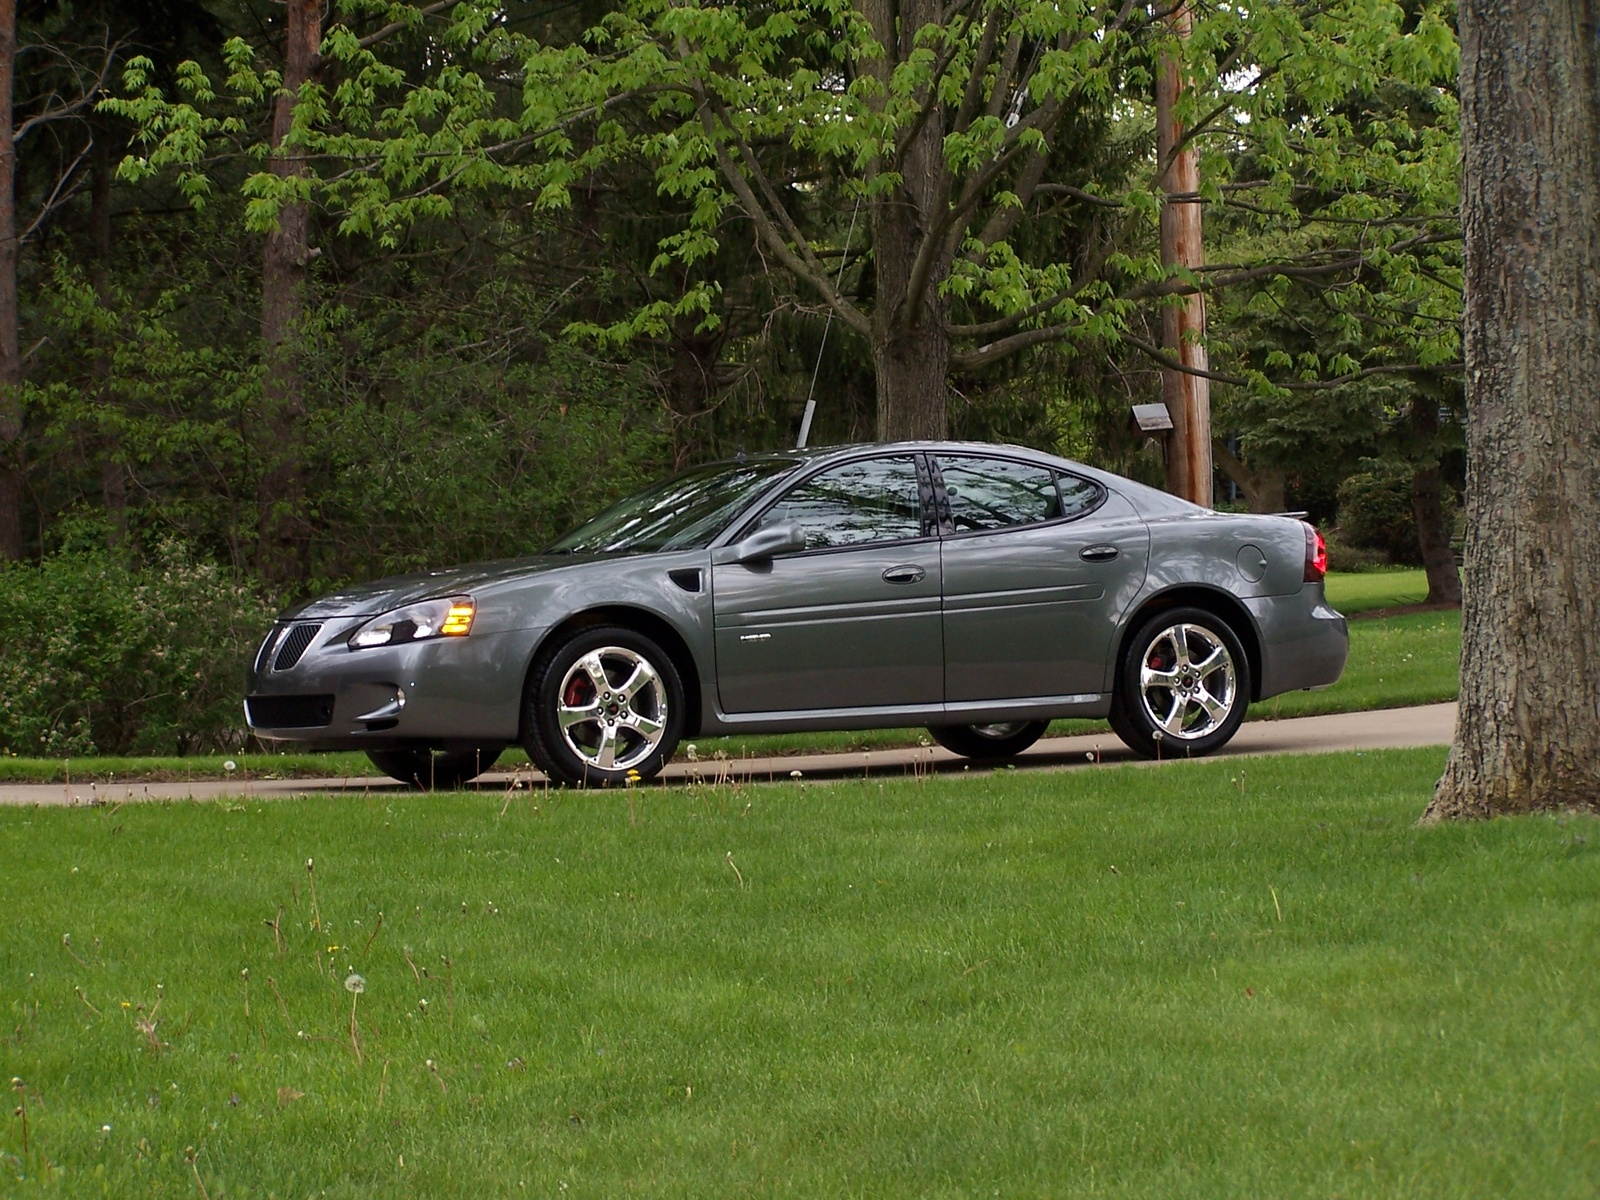 2005 Pontiac Grand Prix GXP - Pictures - 2005 Pontiac Grand Prix GXP ...